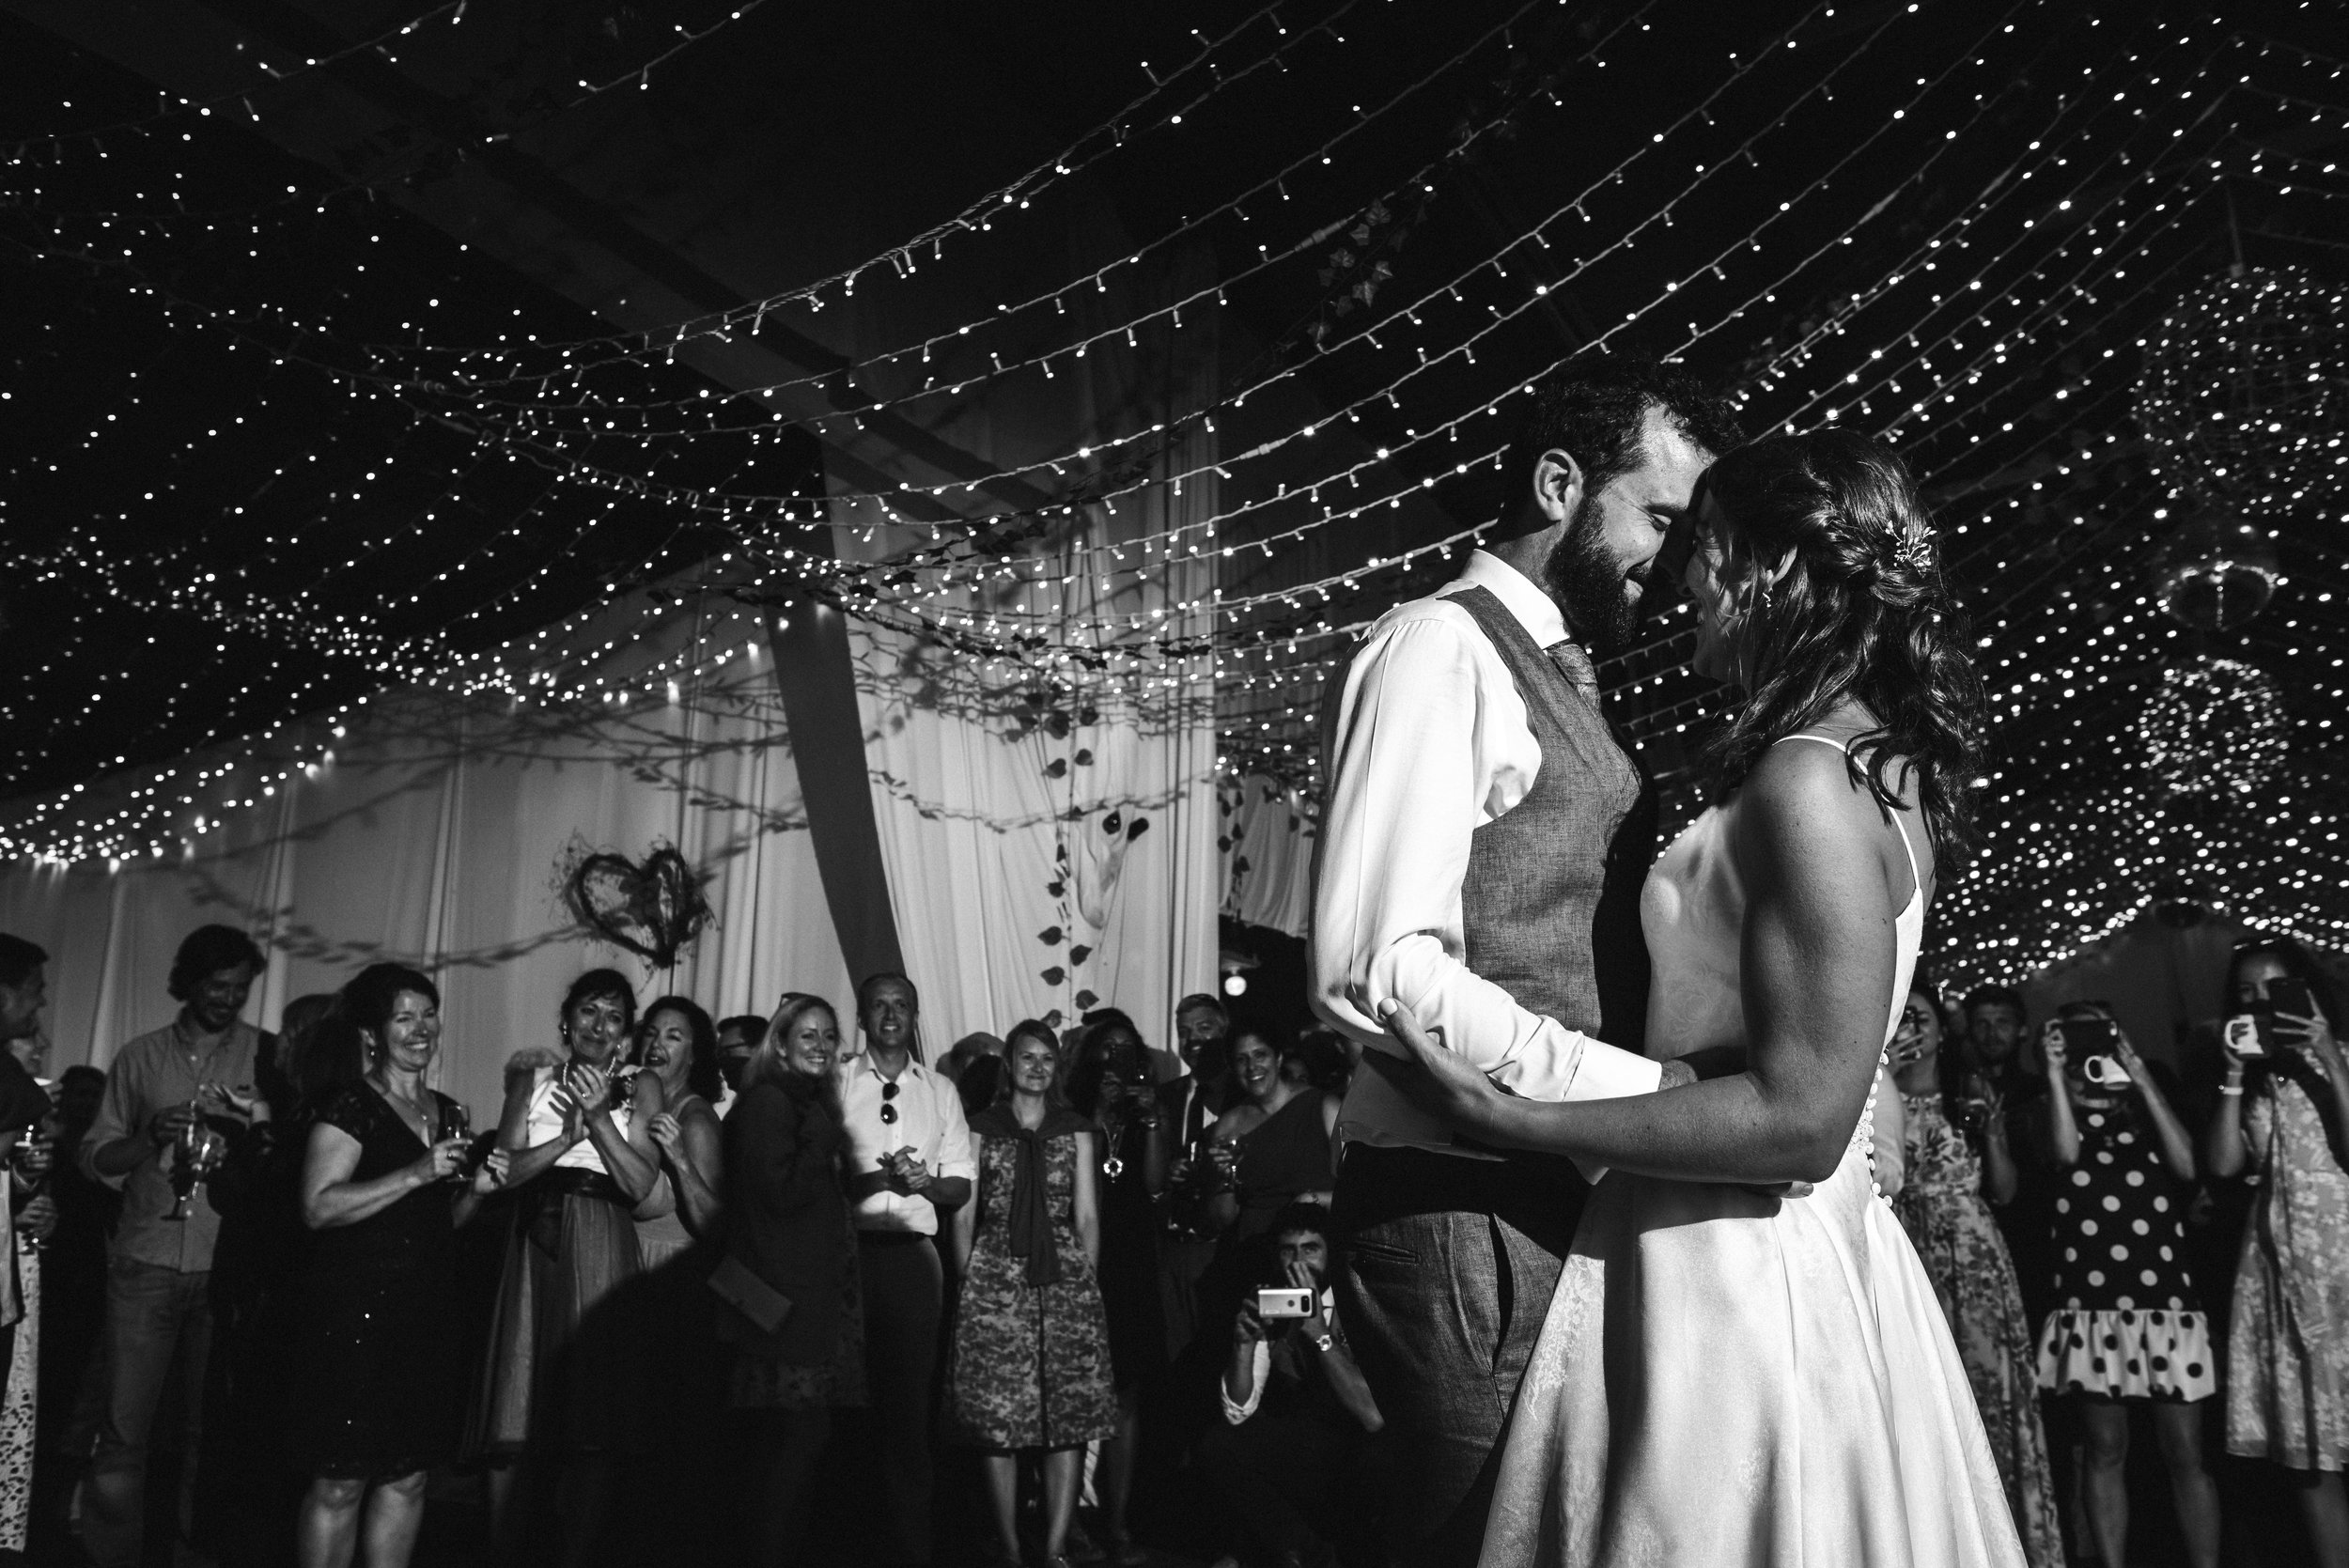 ashbarton-estate-wedding-photographer-mark-shaw-82.jpg